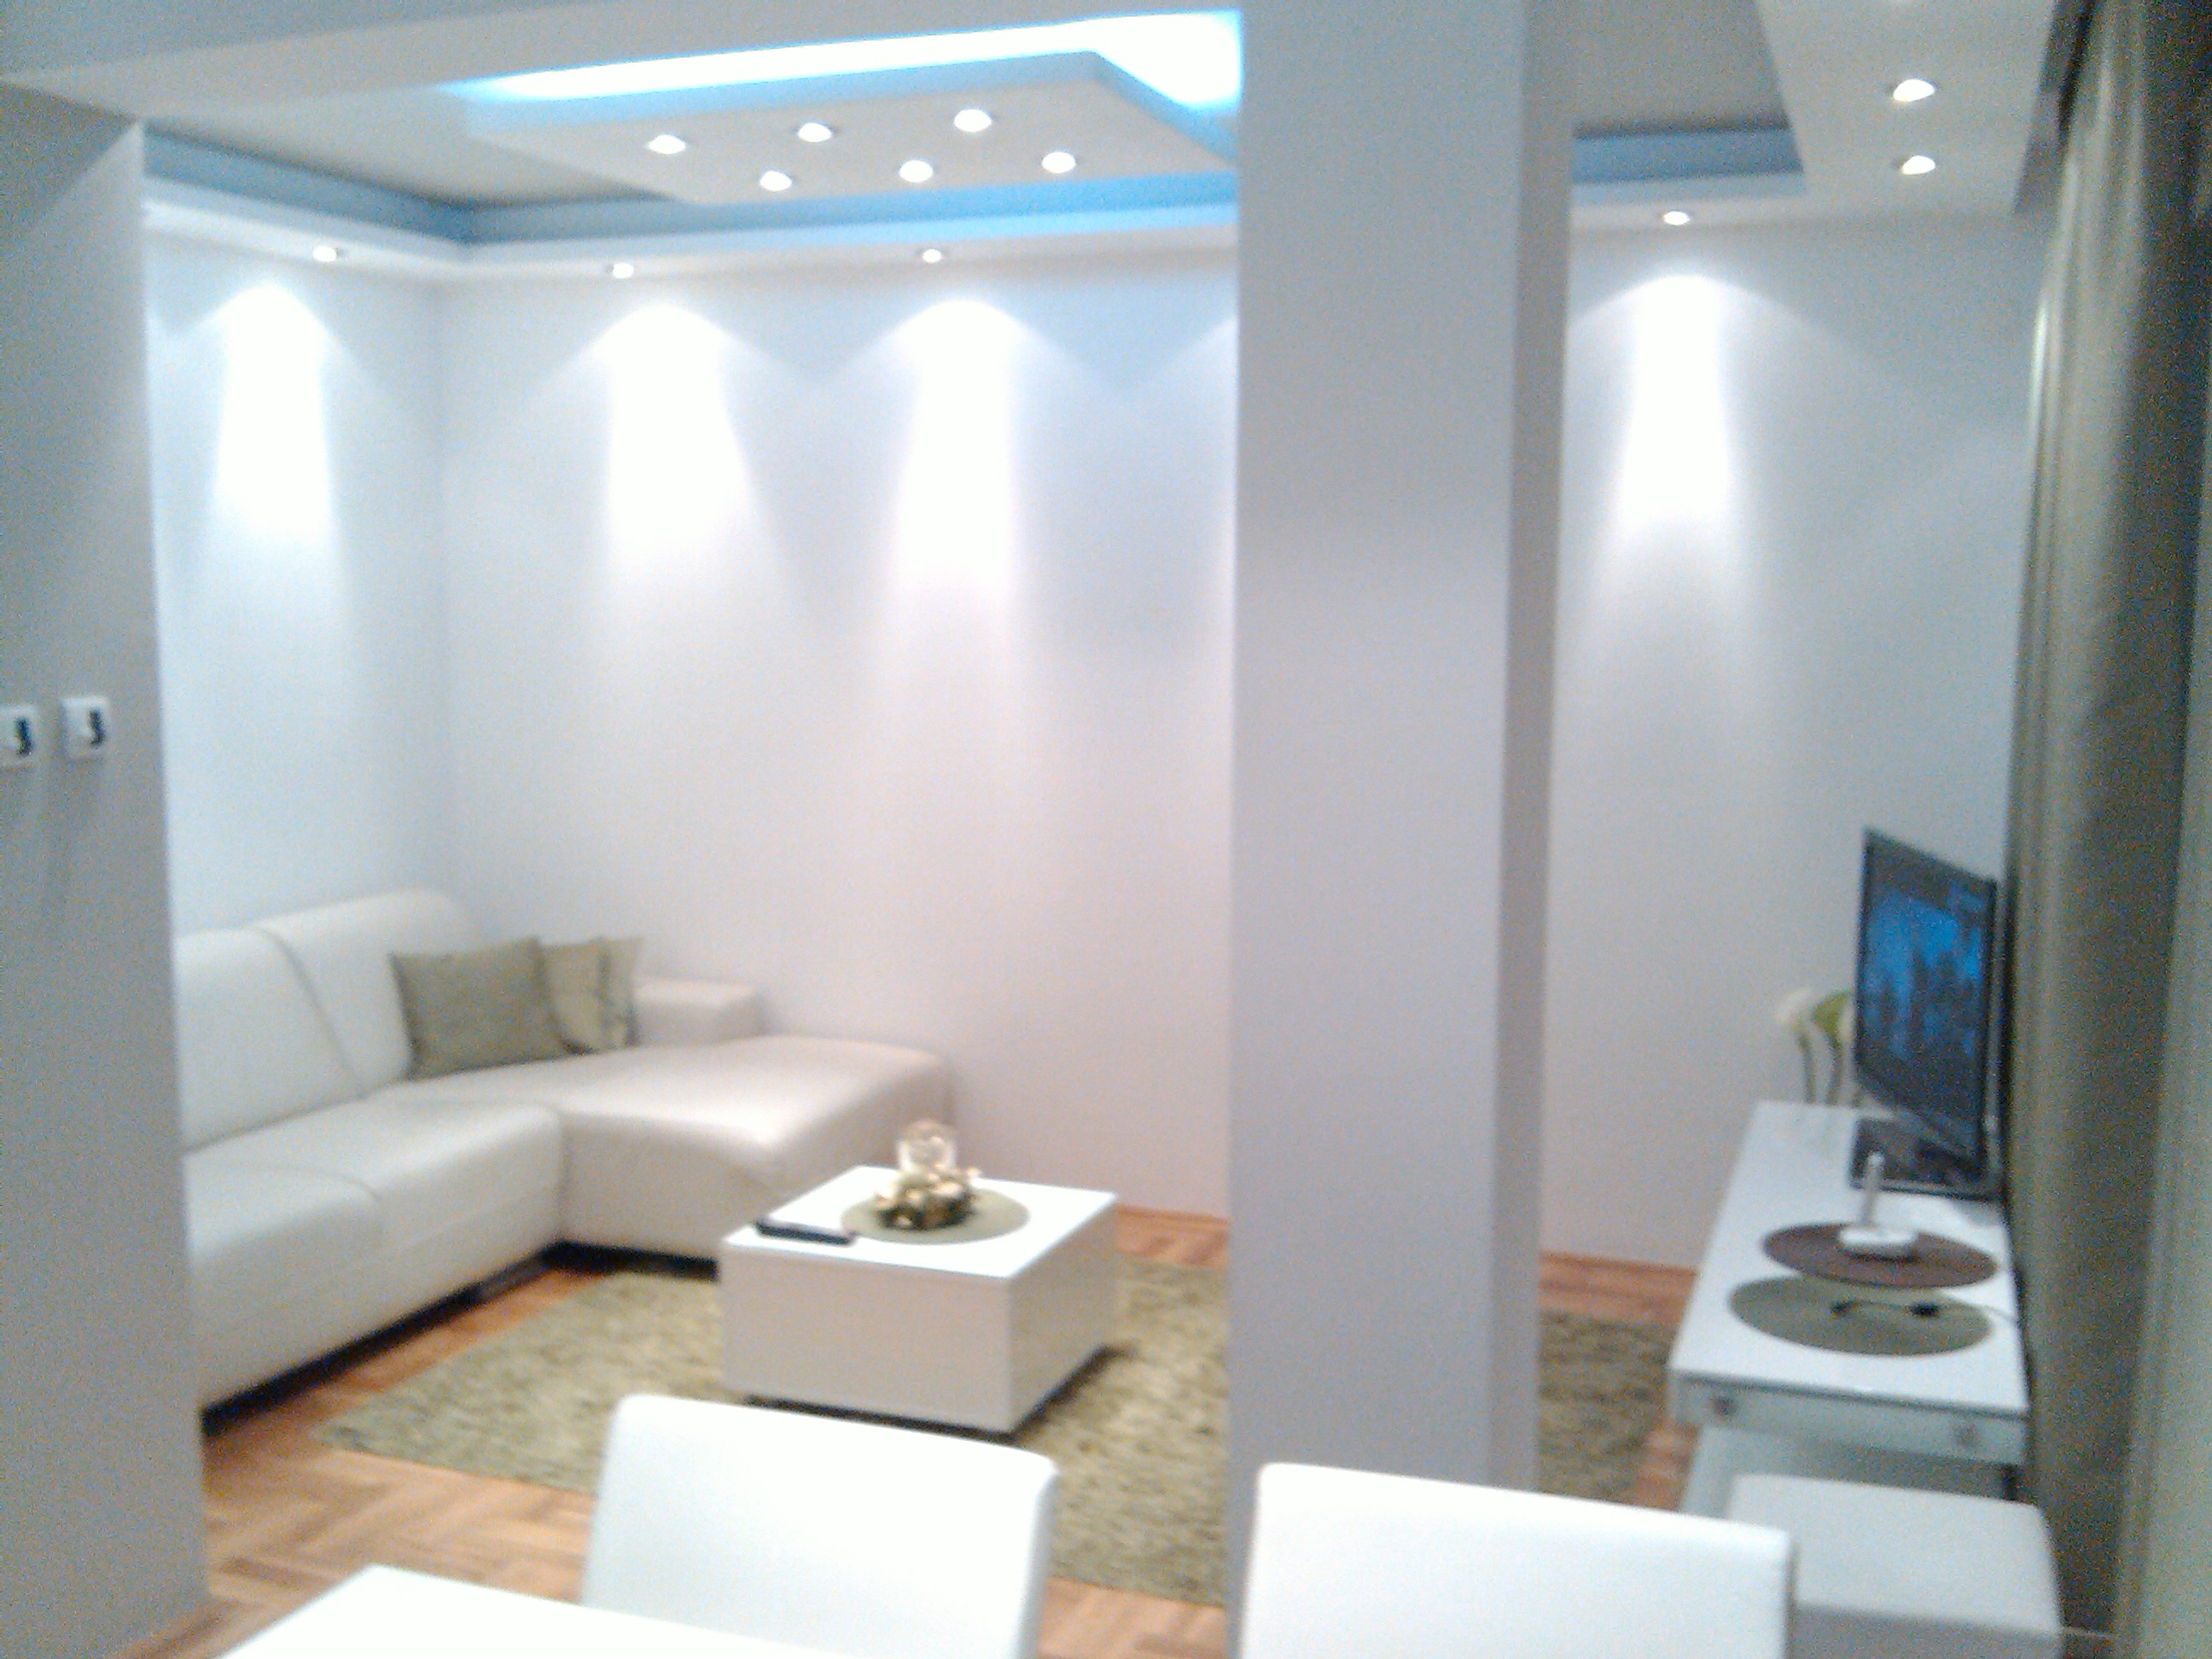 Verkoop 3 slaapkamers novi sad vojvodina servi toplice milana servi - Slaapkamer lay outs ...